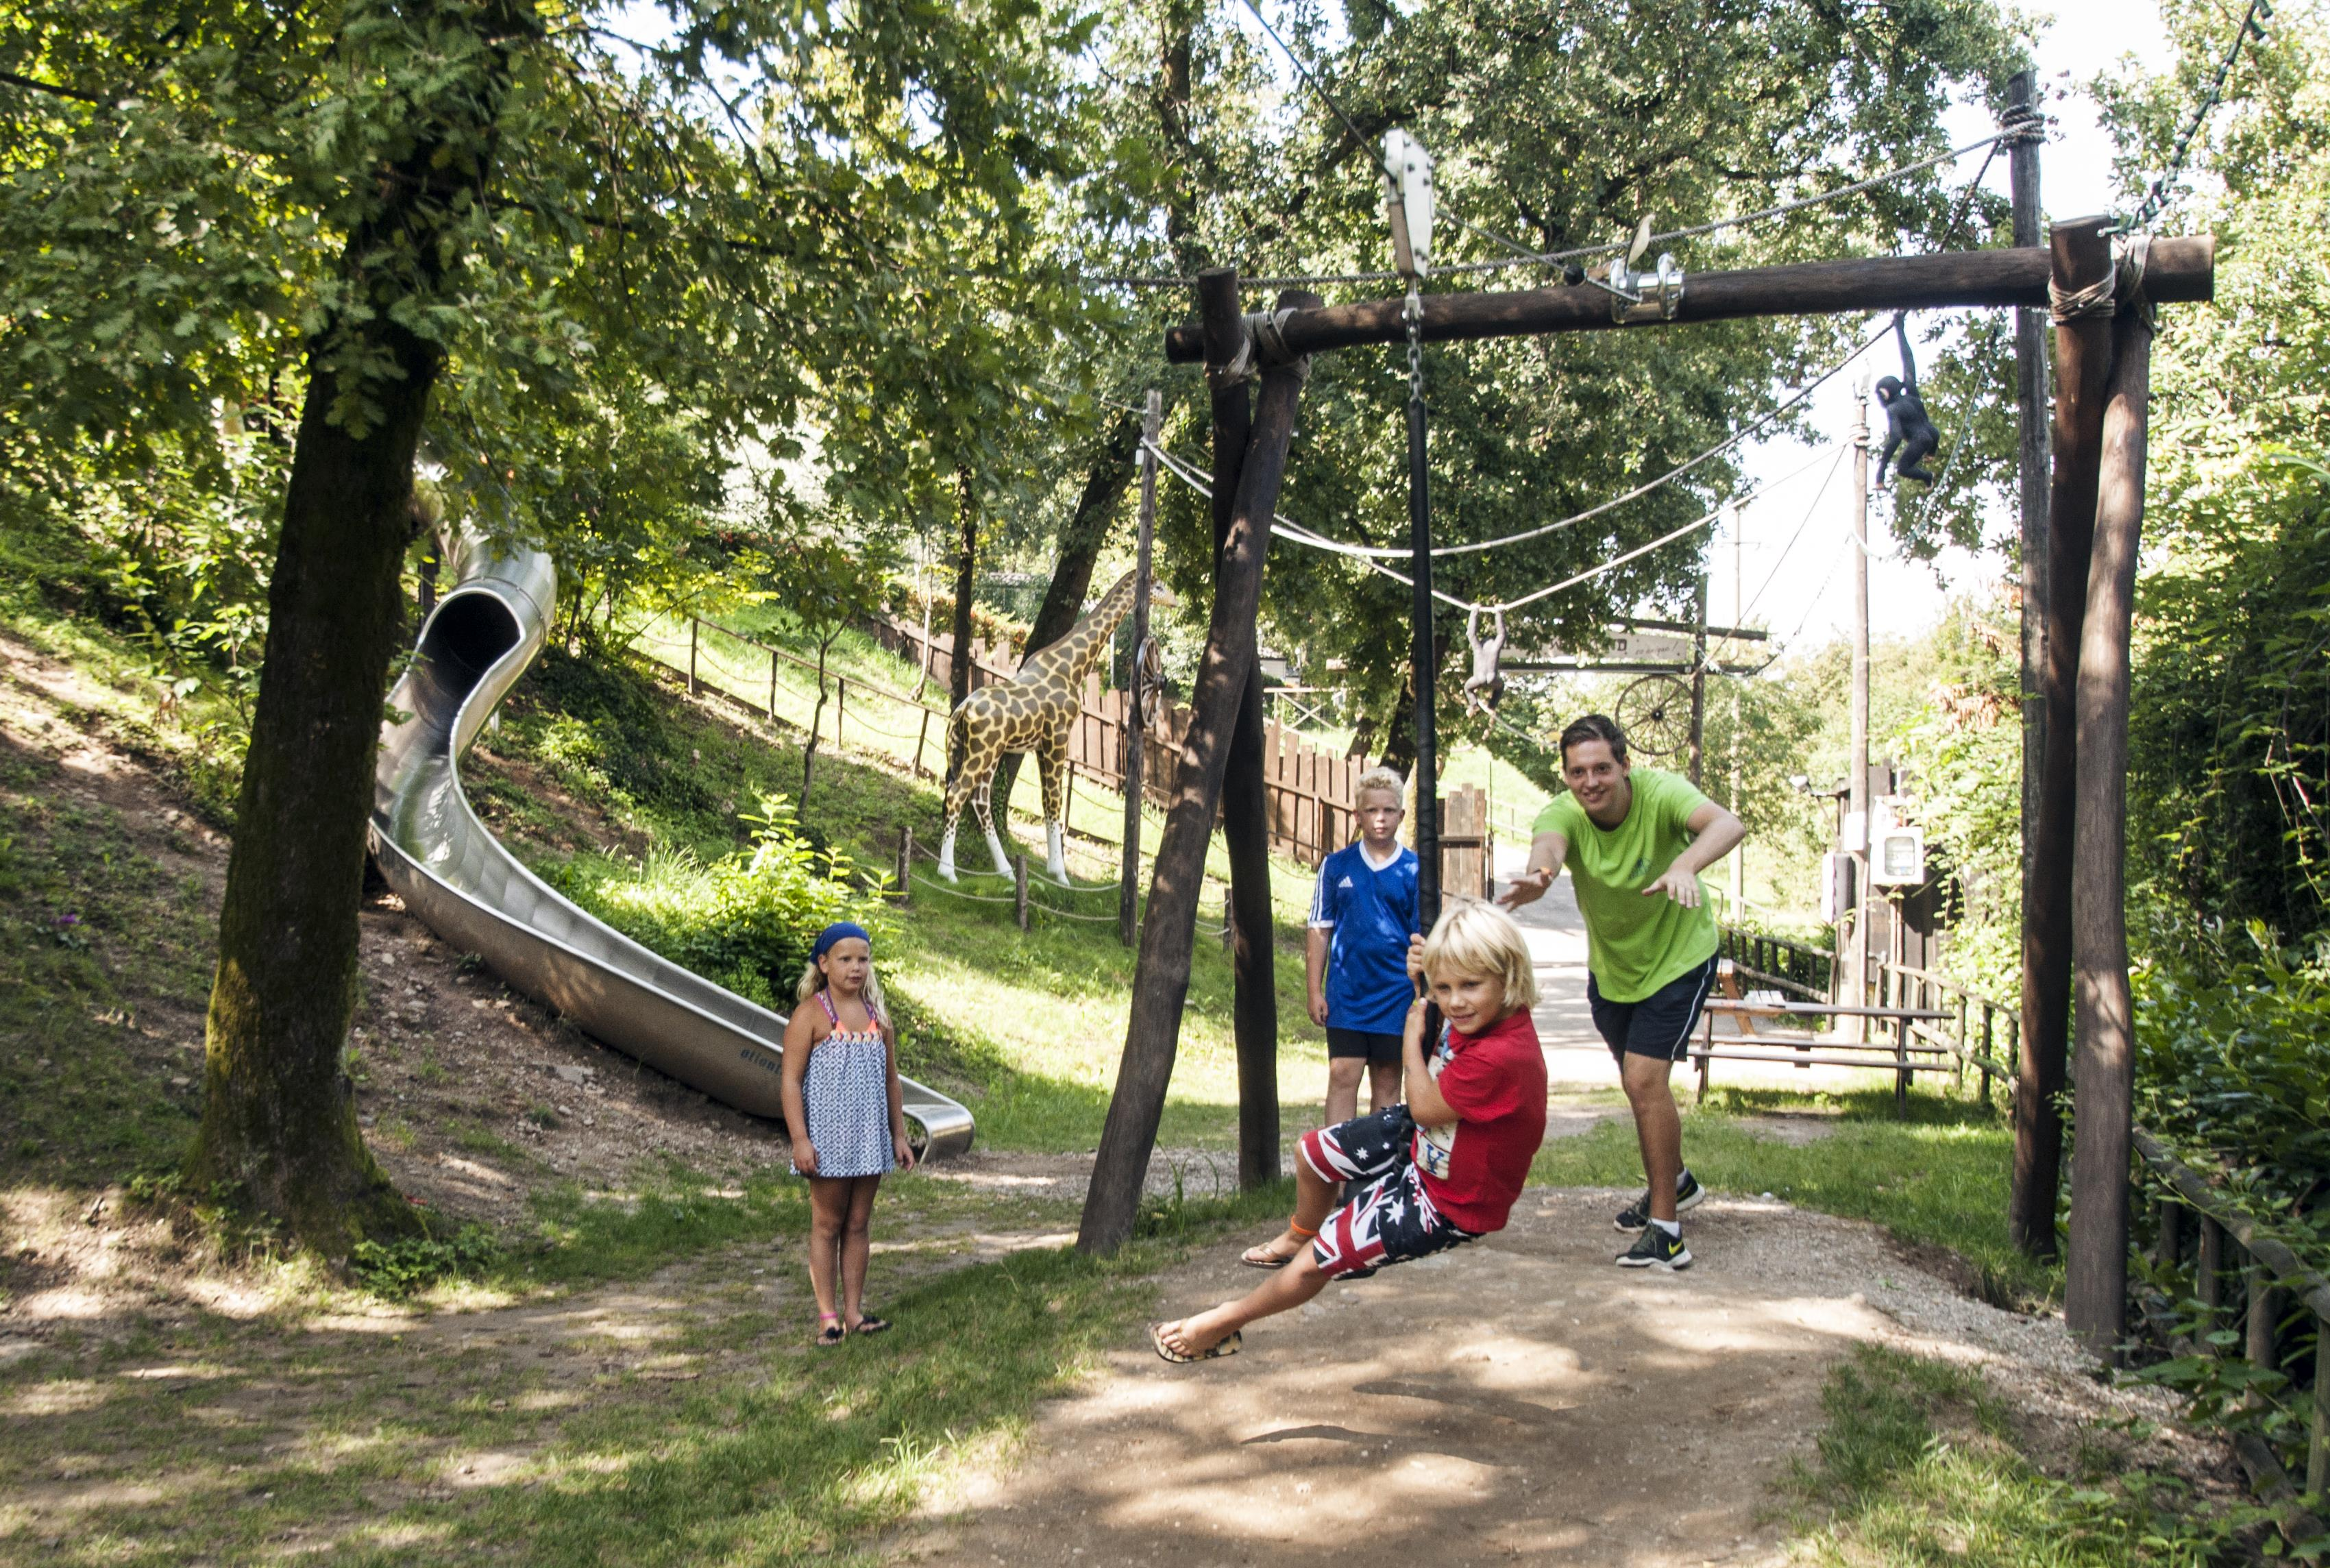 Kinderspeelplaats Ropeway Familievakantie